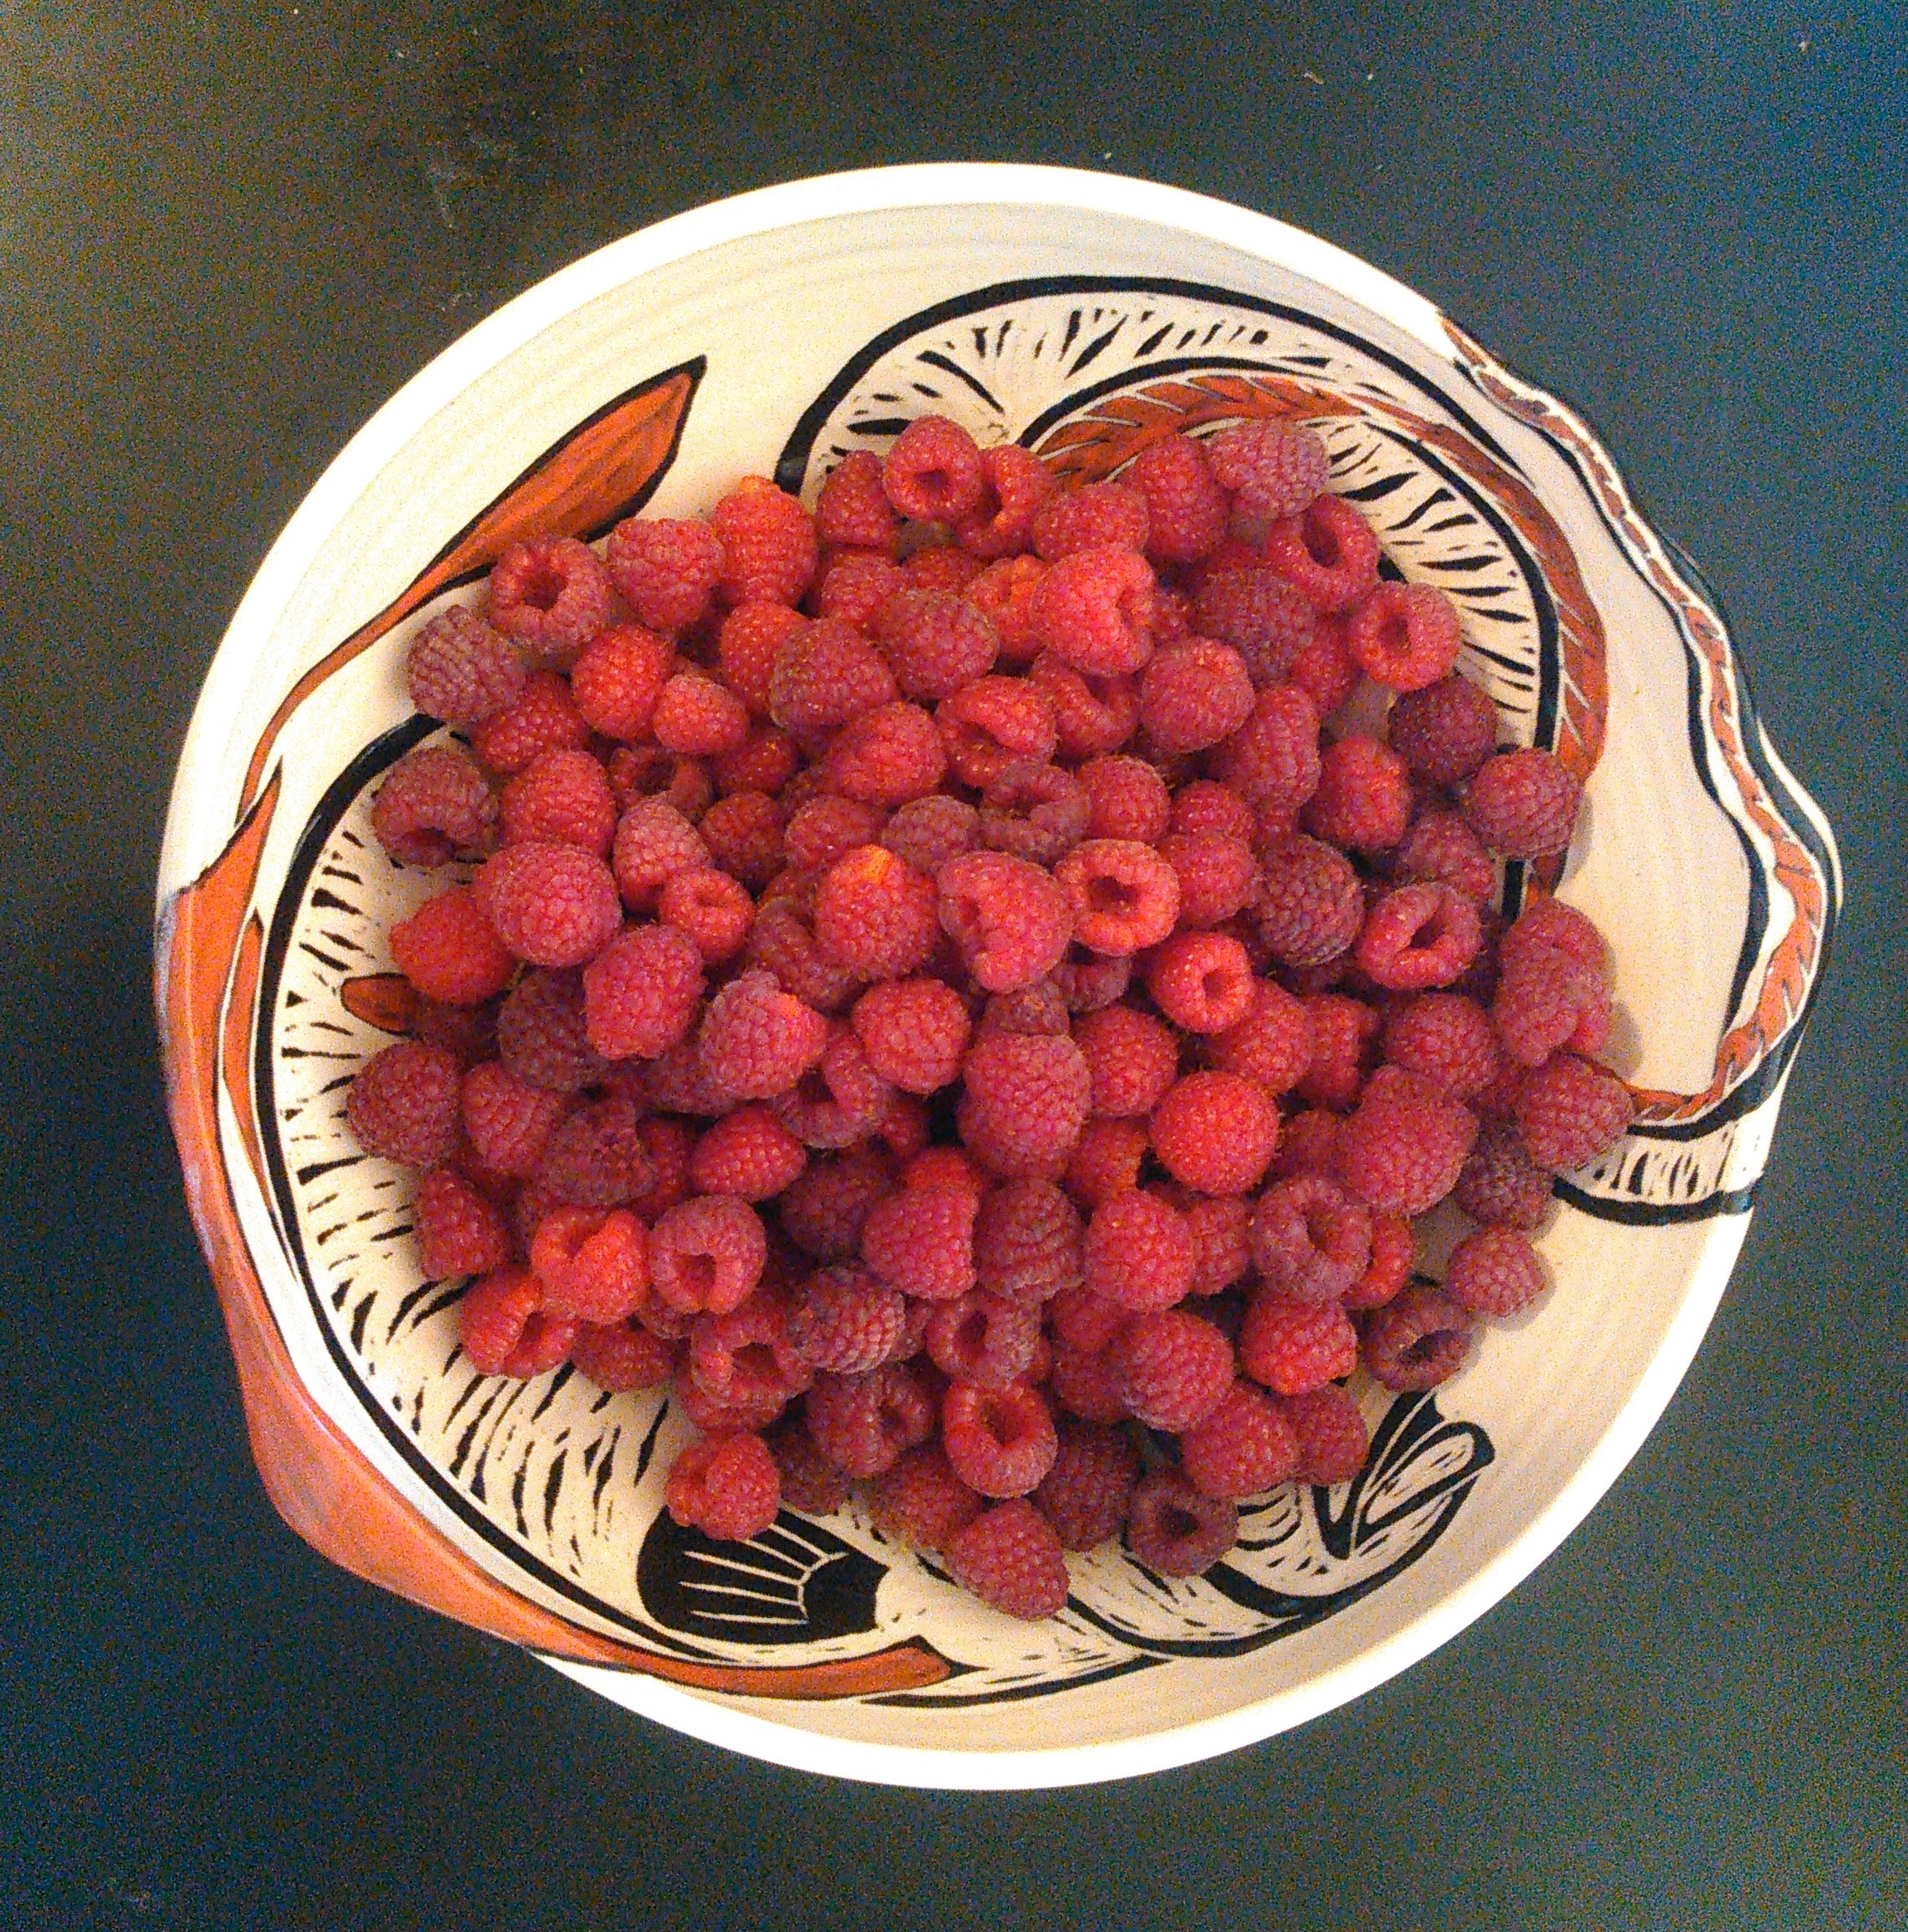 Bee Poliinated Berries